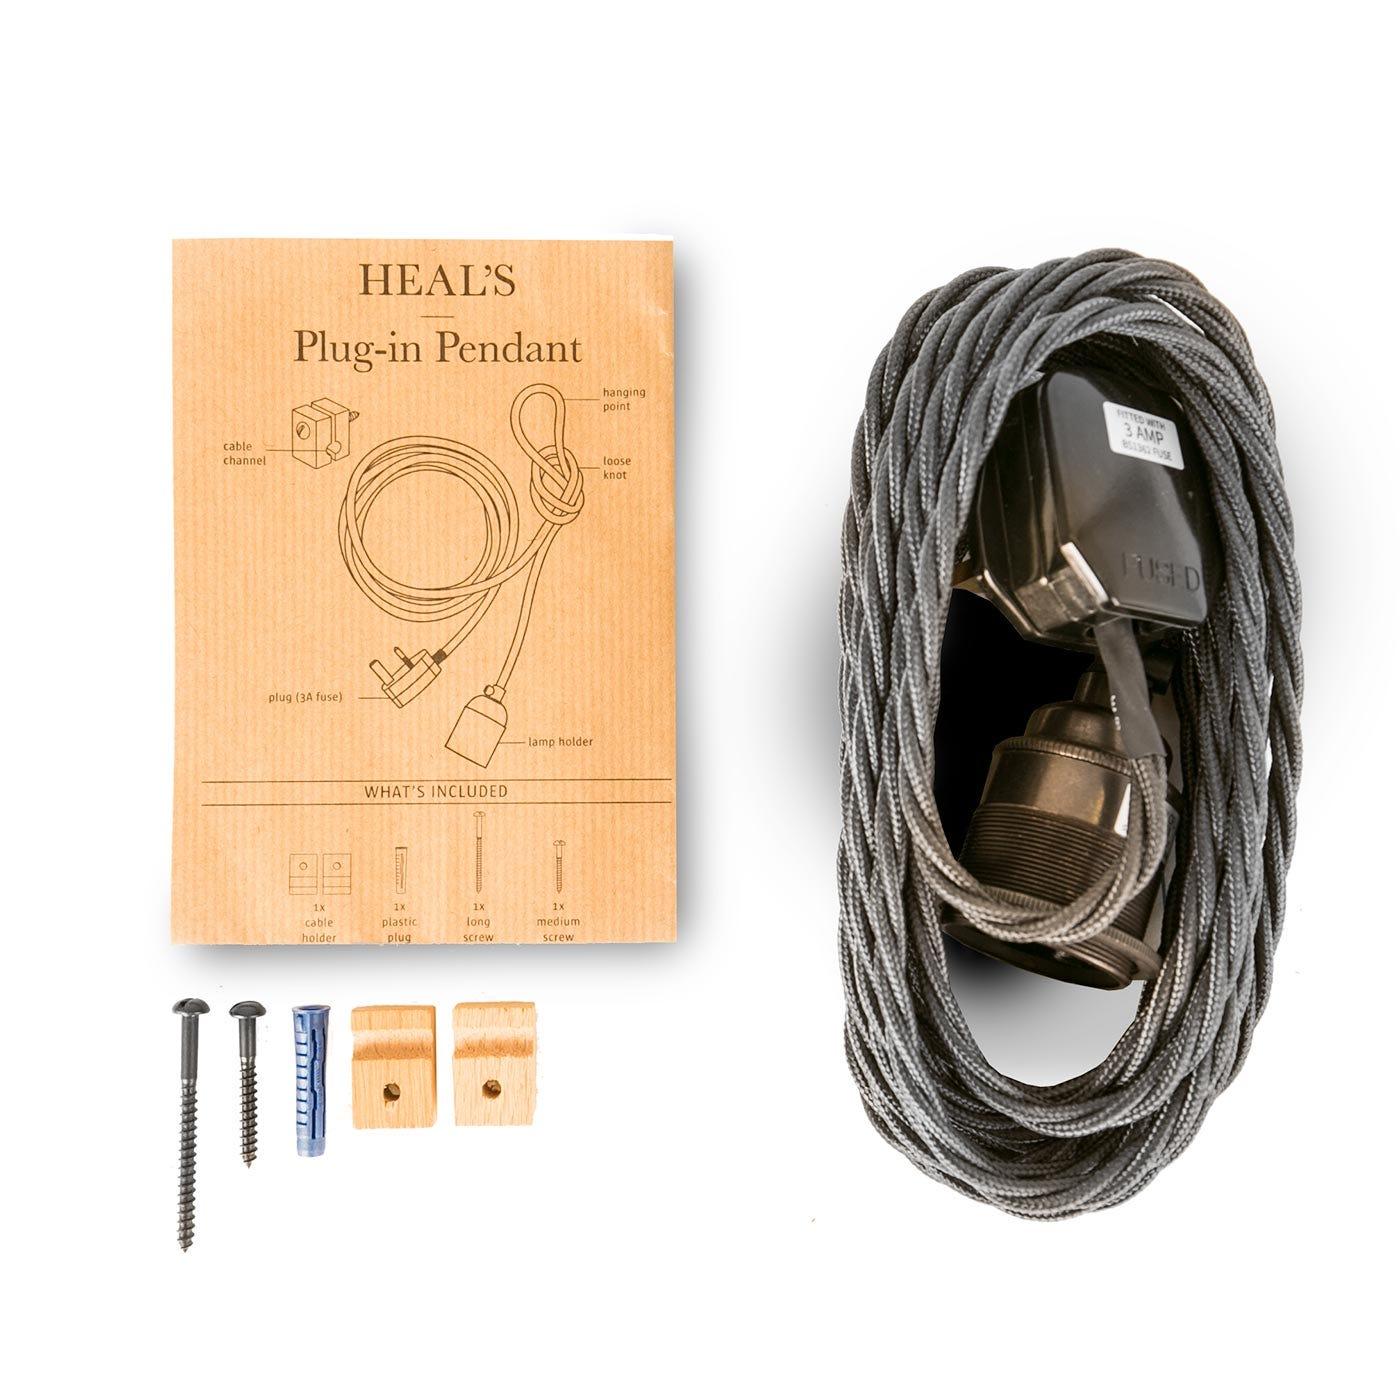 Heals plug in hanging pendant discontinued heals aloadofball Images